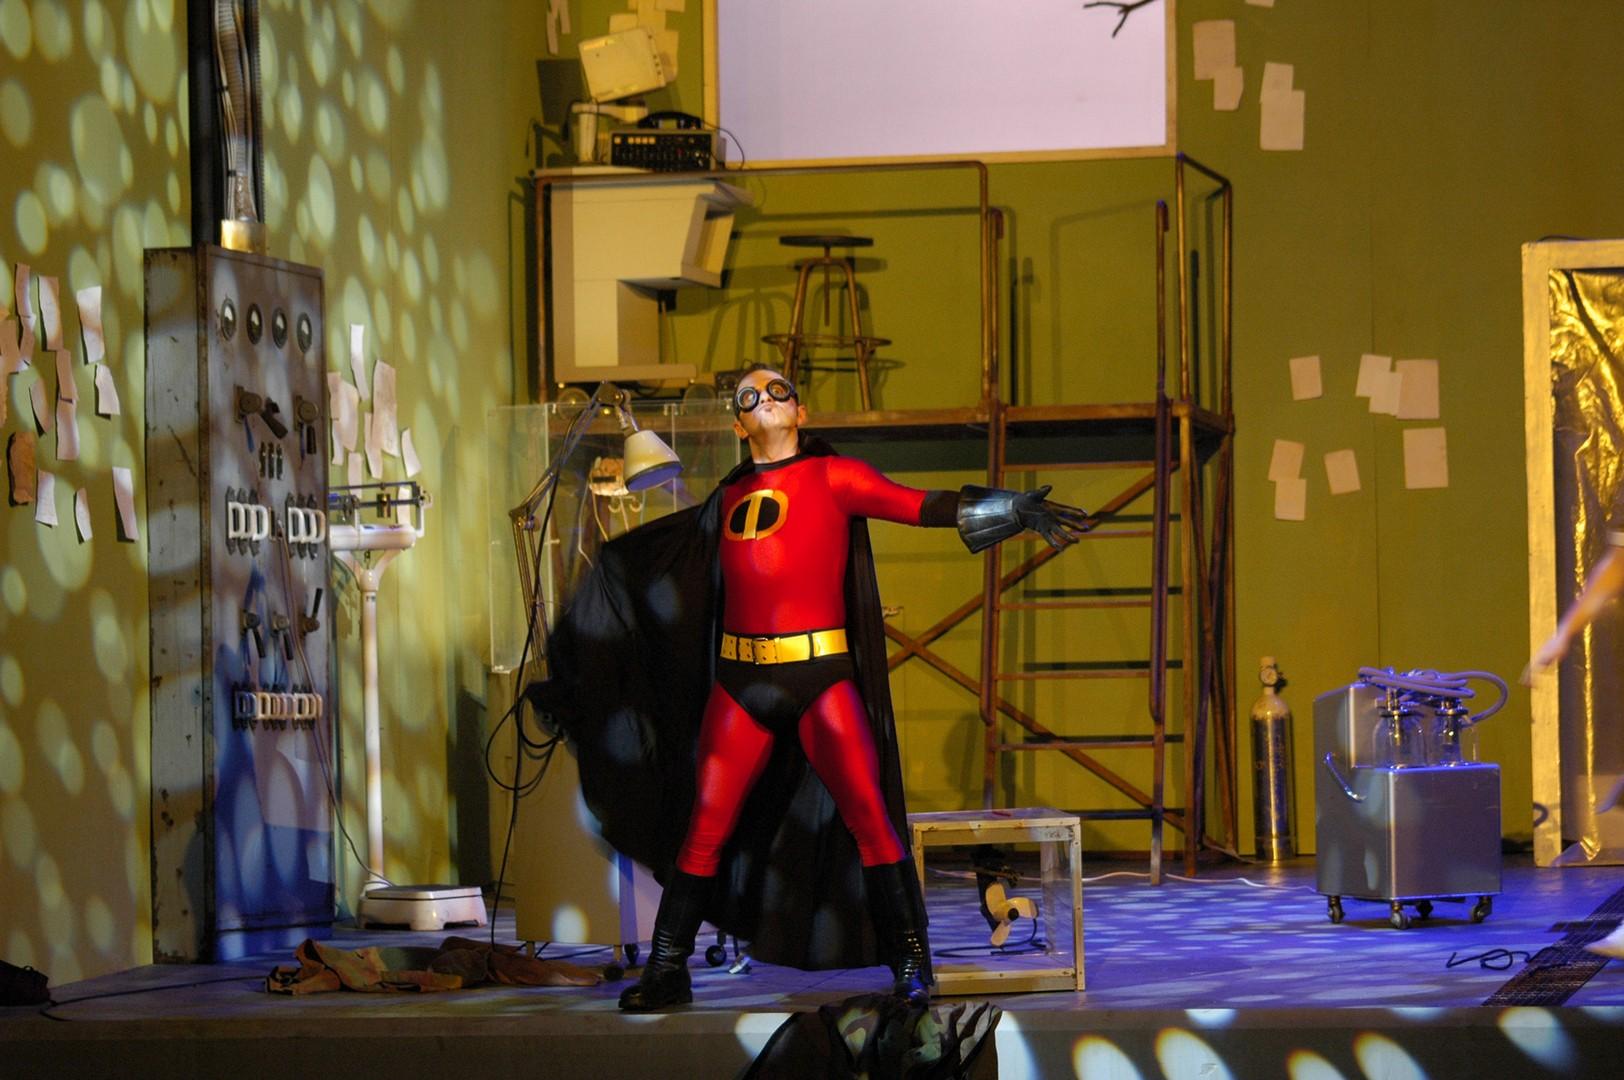 Serva-Padrona-Opera-directed-by-Jacopo-Spirei-superhero